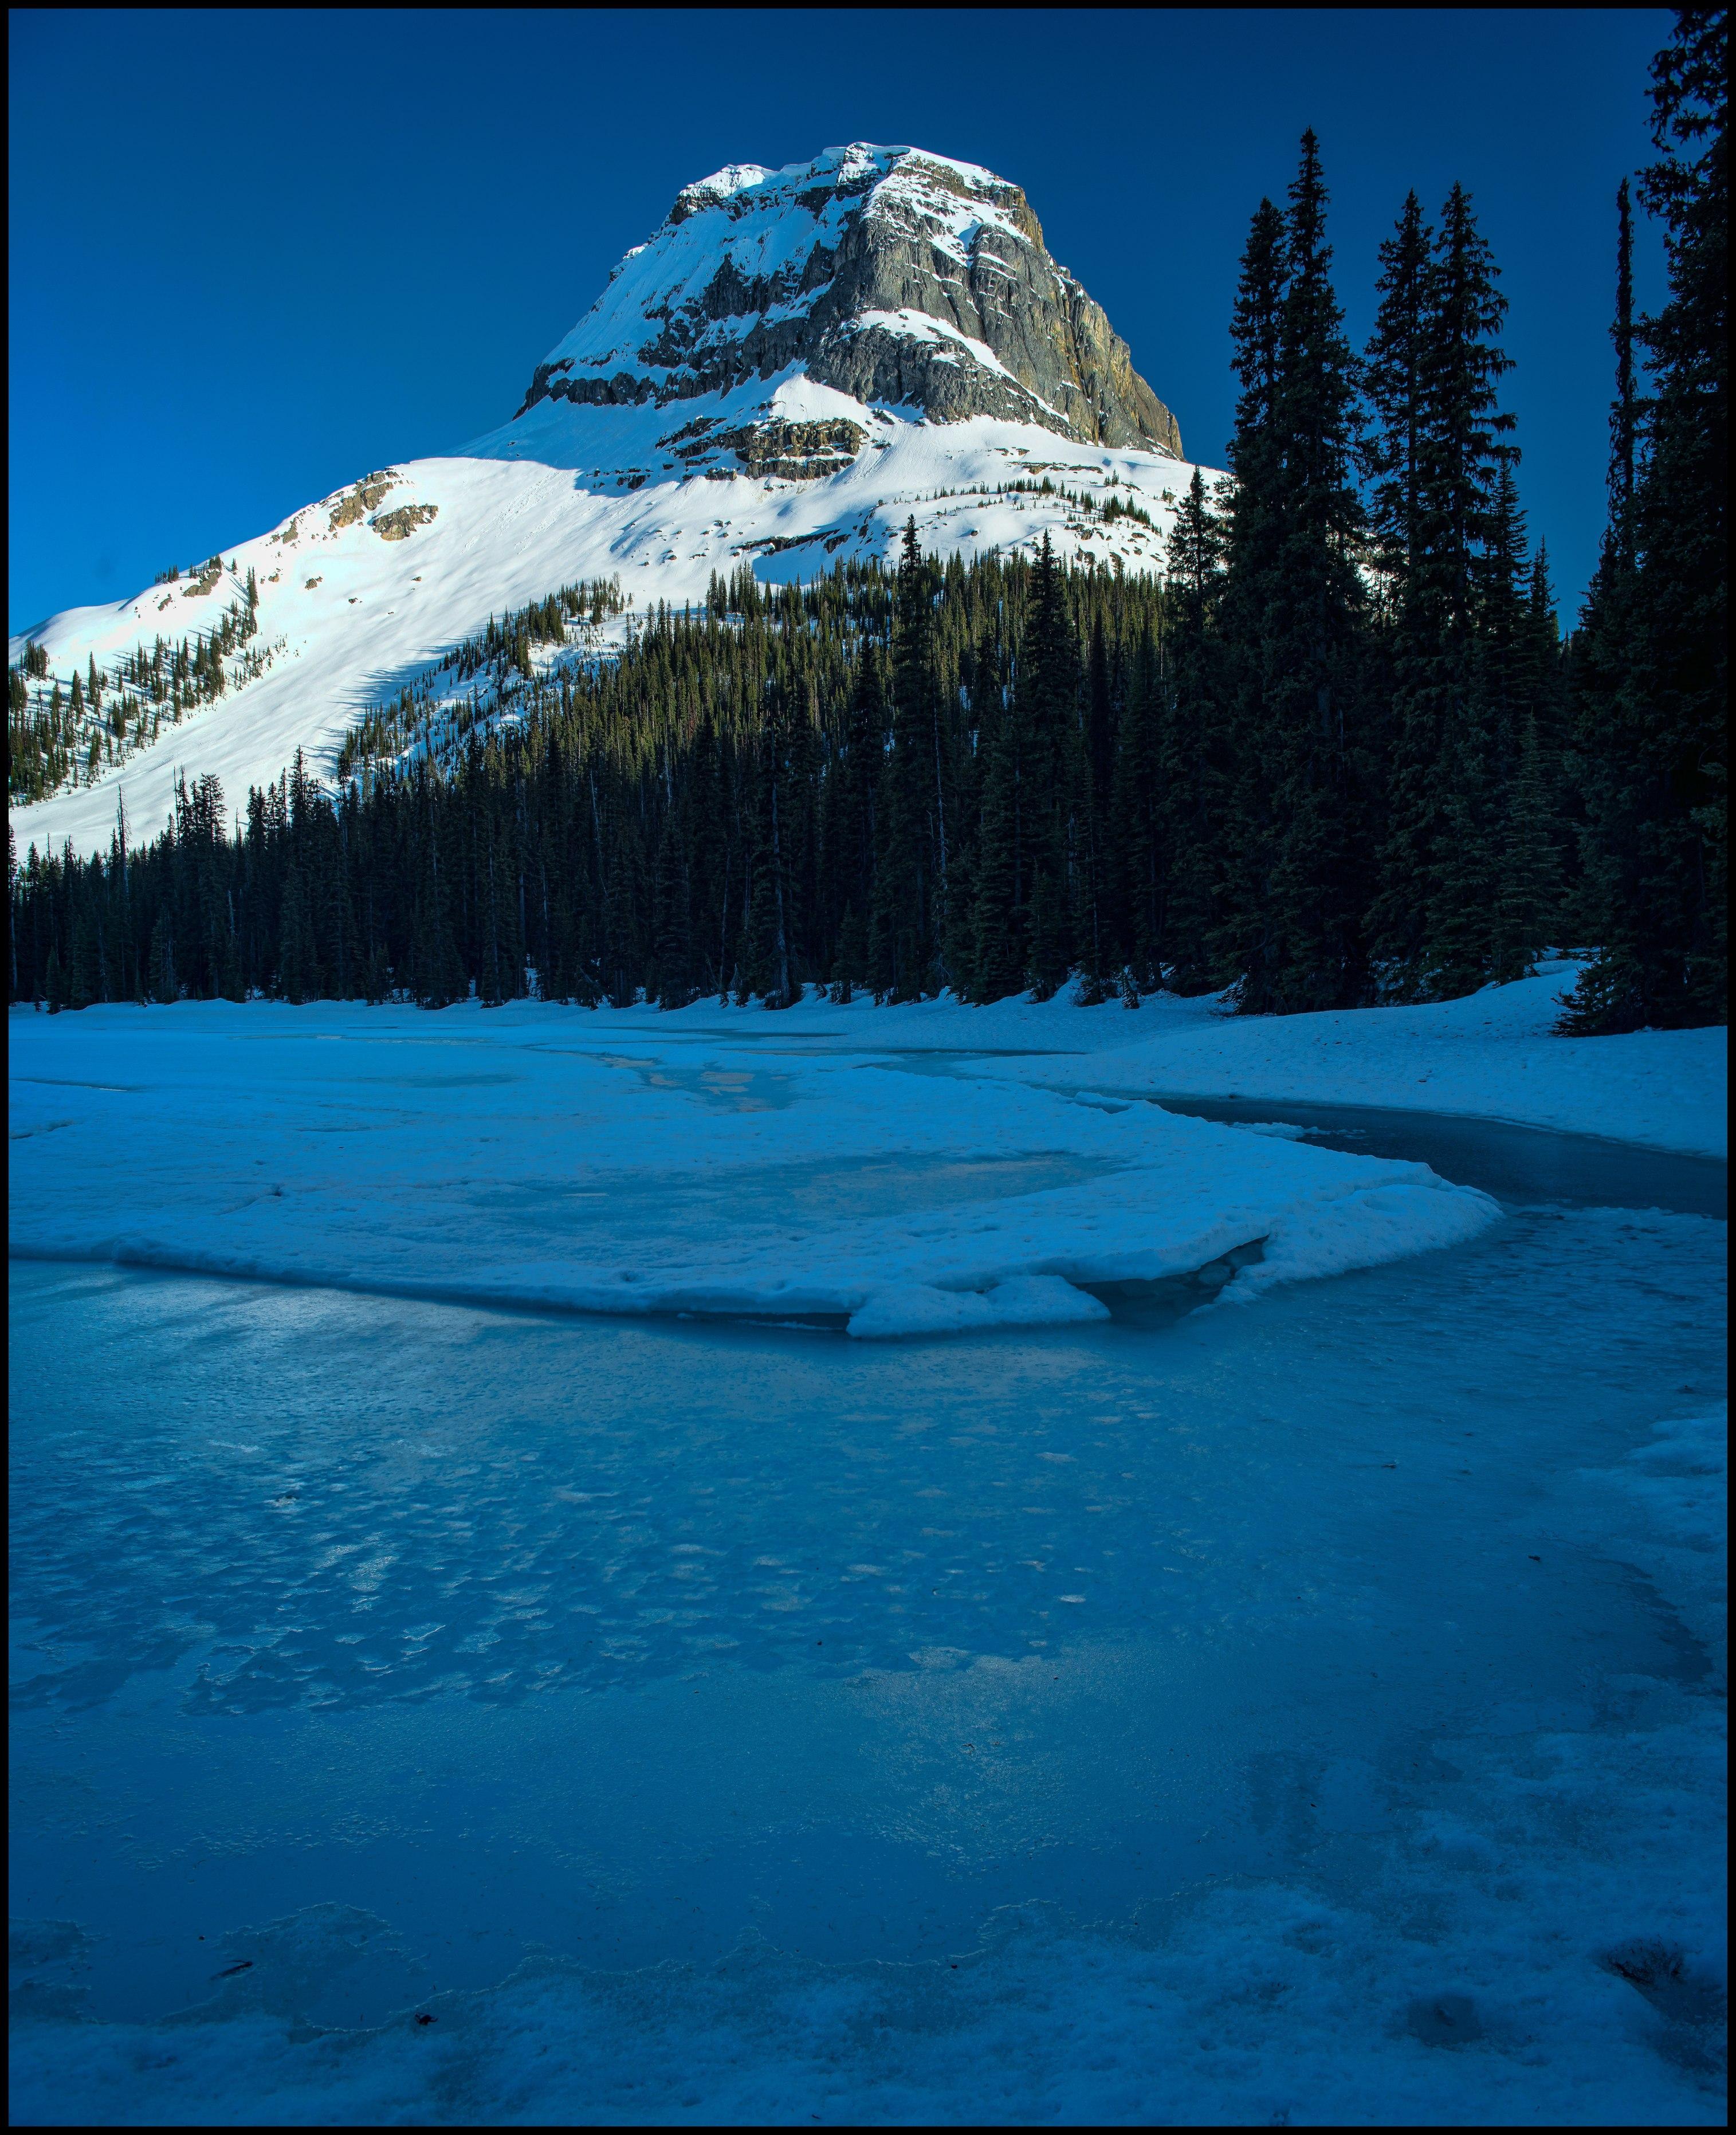 Last light at frozen Yoho Lake Winter Camping Sony A7 / Canon FD Tilt Shift 35 2.8